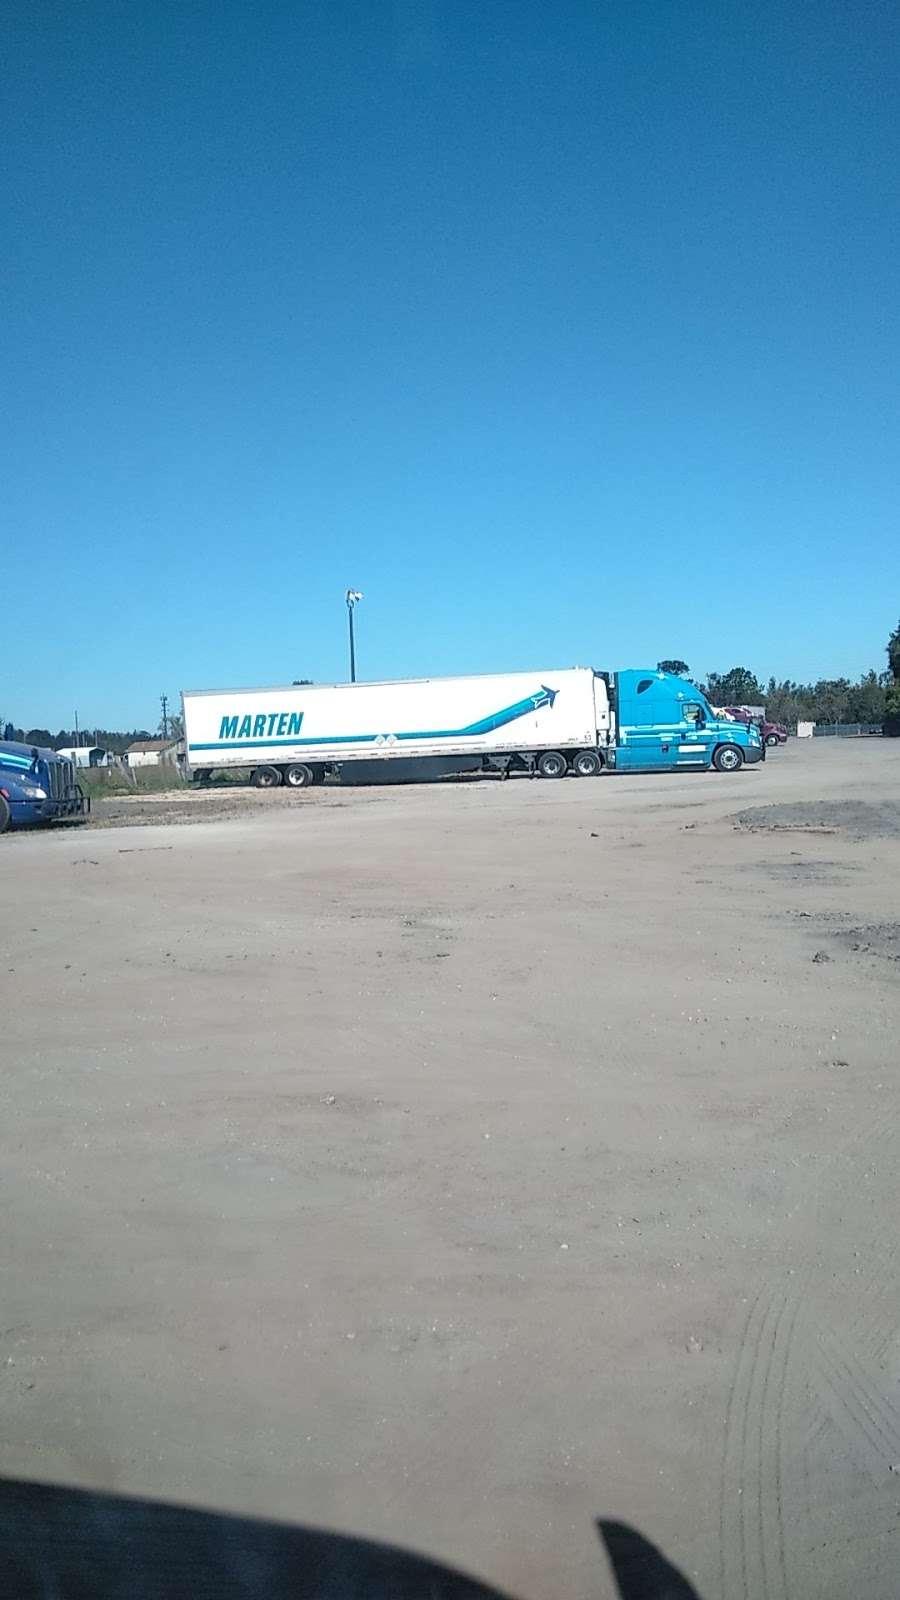 Marten Transport drop yard - moving company  | Photo 1 of 1 | Address: 11699 Airport Park Dr, Orlando, FL 32824, USA